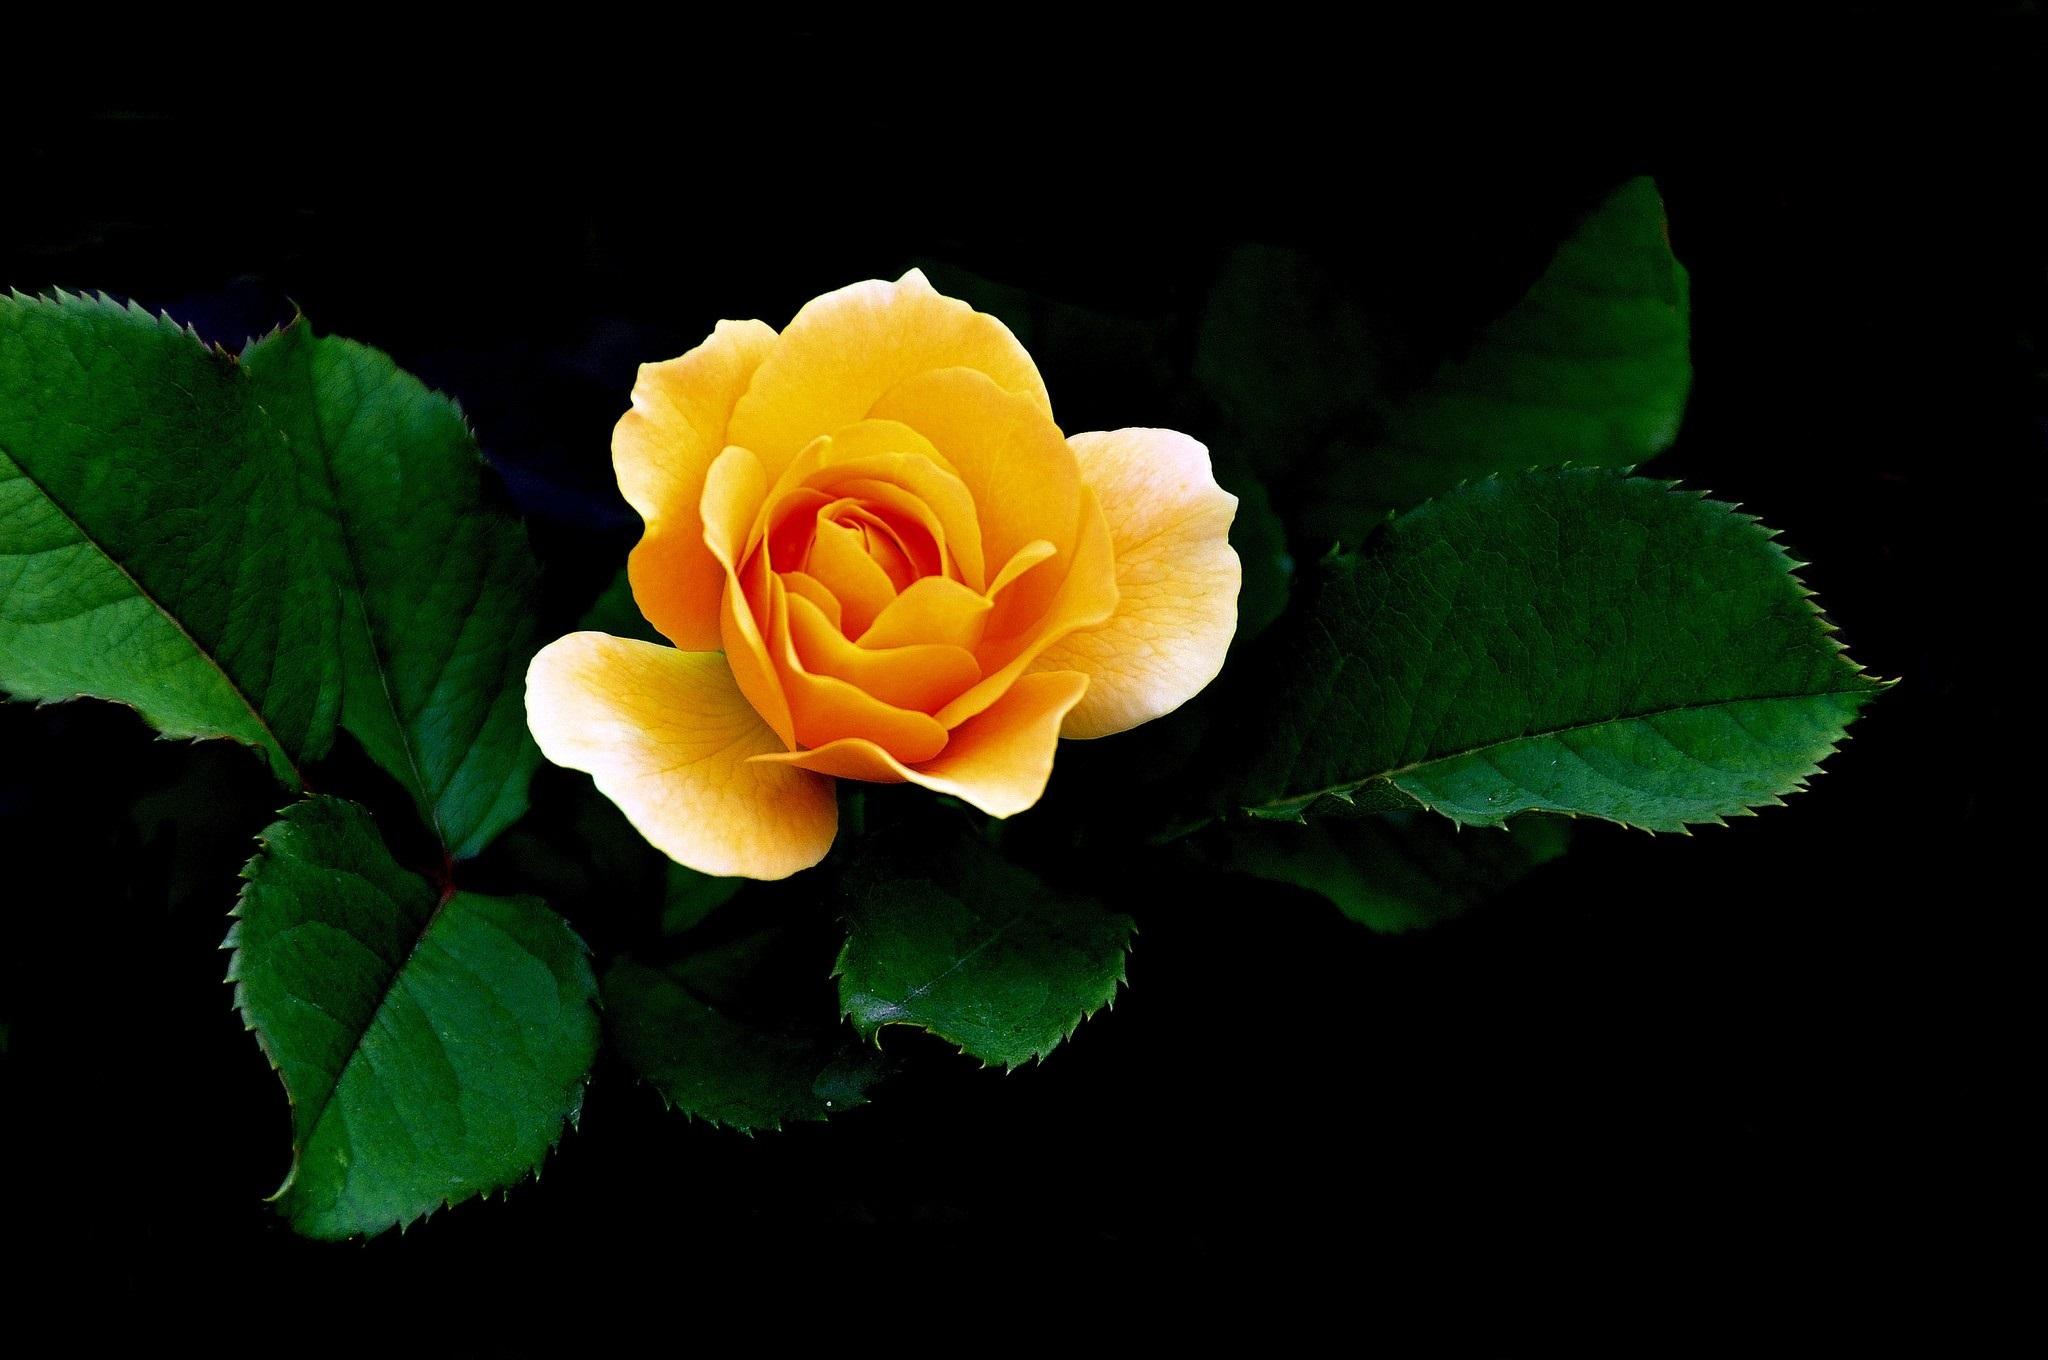 Hd wallpaper yellow rose - Hd Wallpaper Yellow Rose Hd Wallpaper Yellow Rose 7